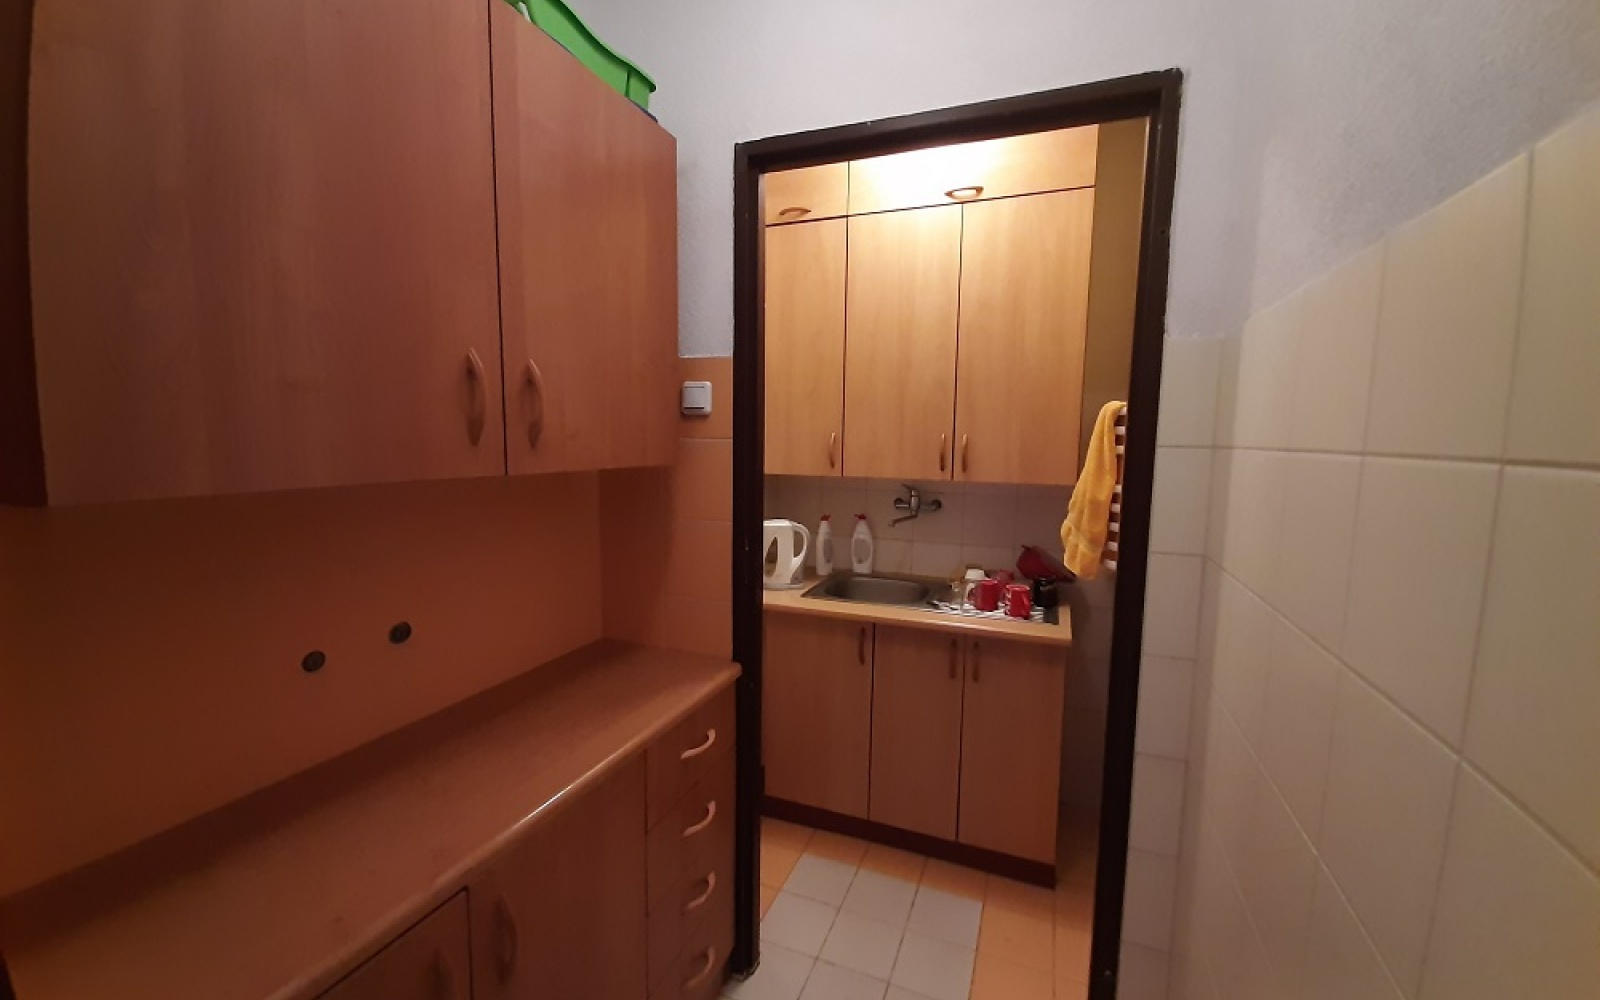 2 BathroomsBathrooms,Lokale użytkowe,Wynajem,1033